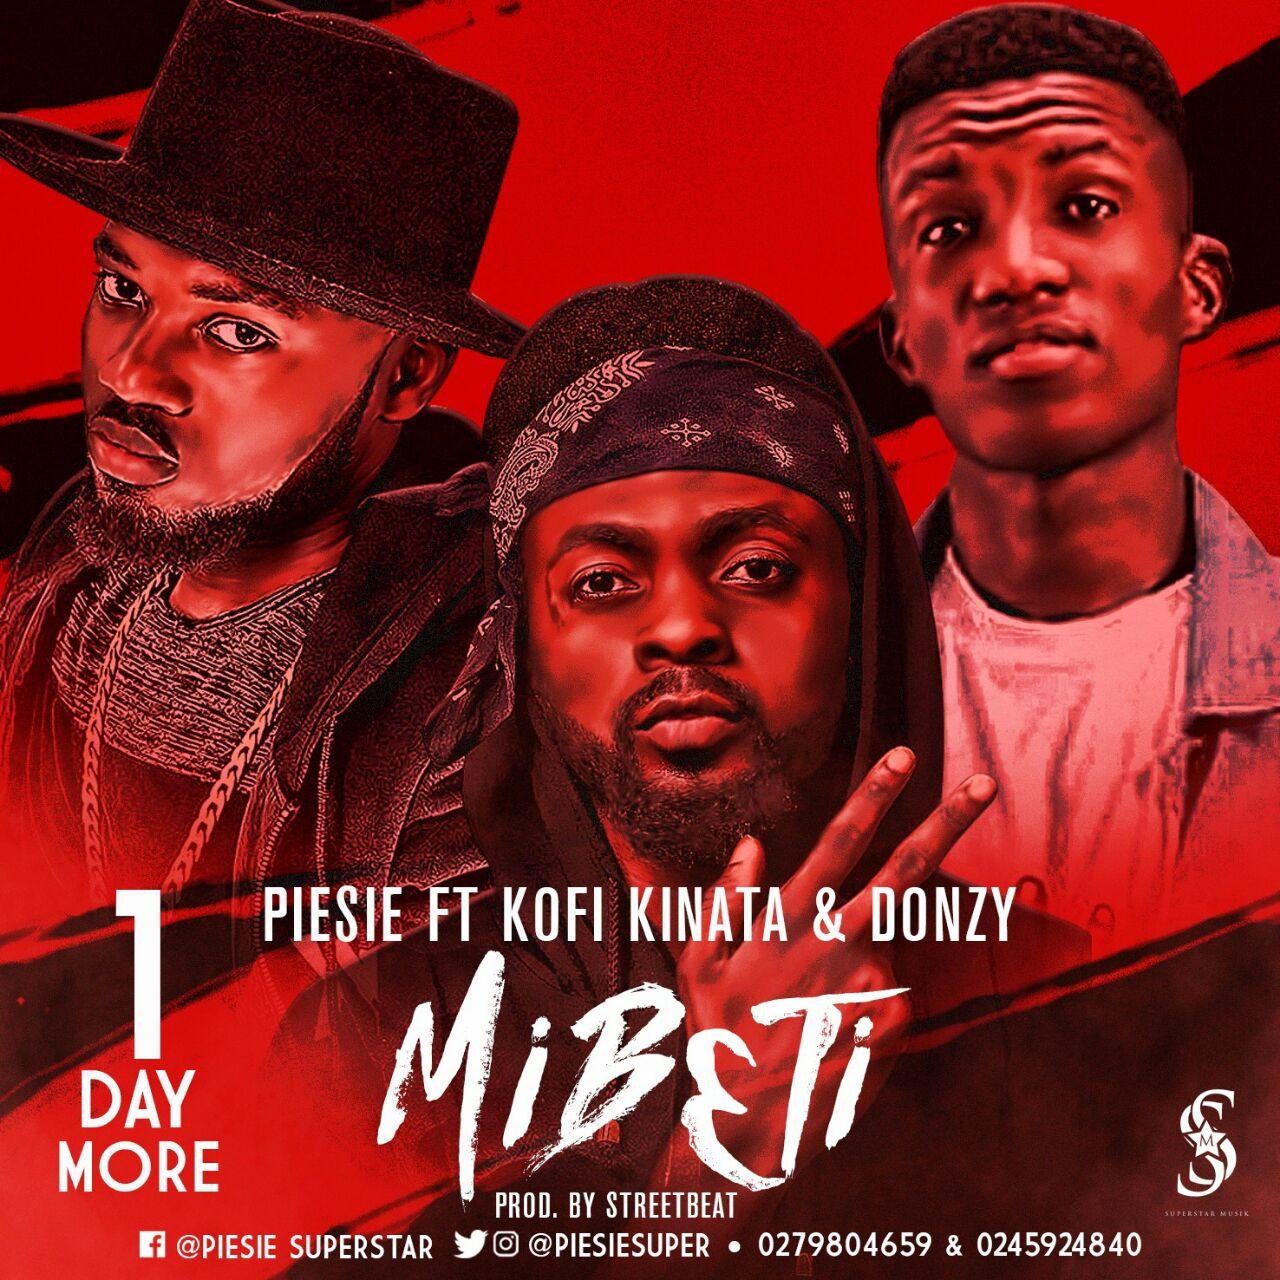 piesie-mib3ti-ft-donzy-kofi-kinaata-prod-by-iamstreetbeatgh